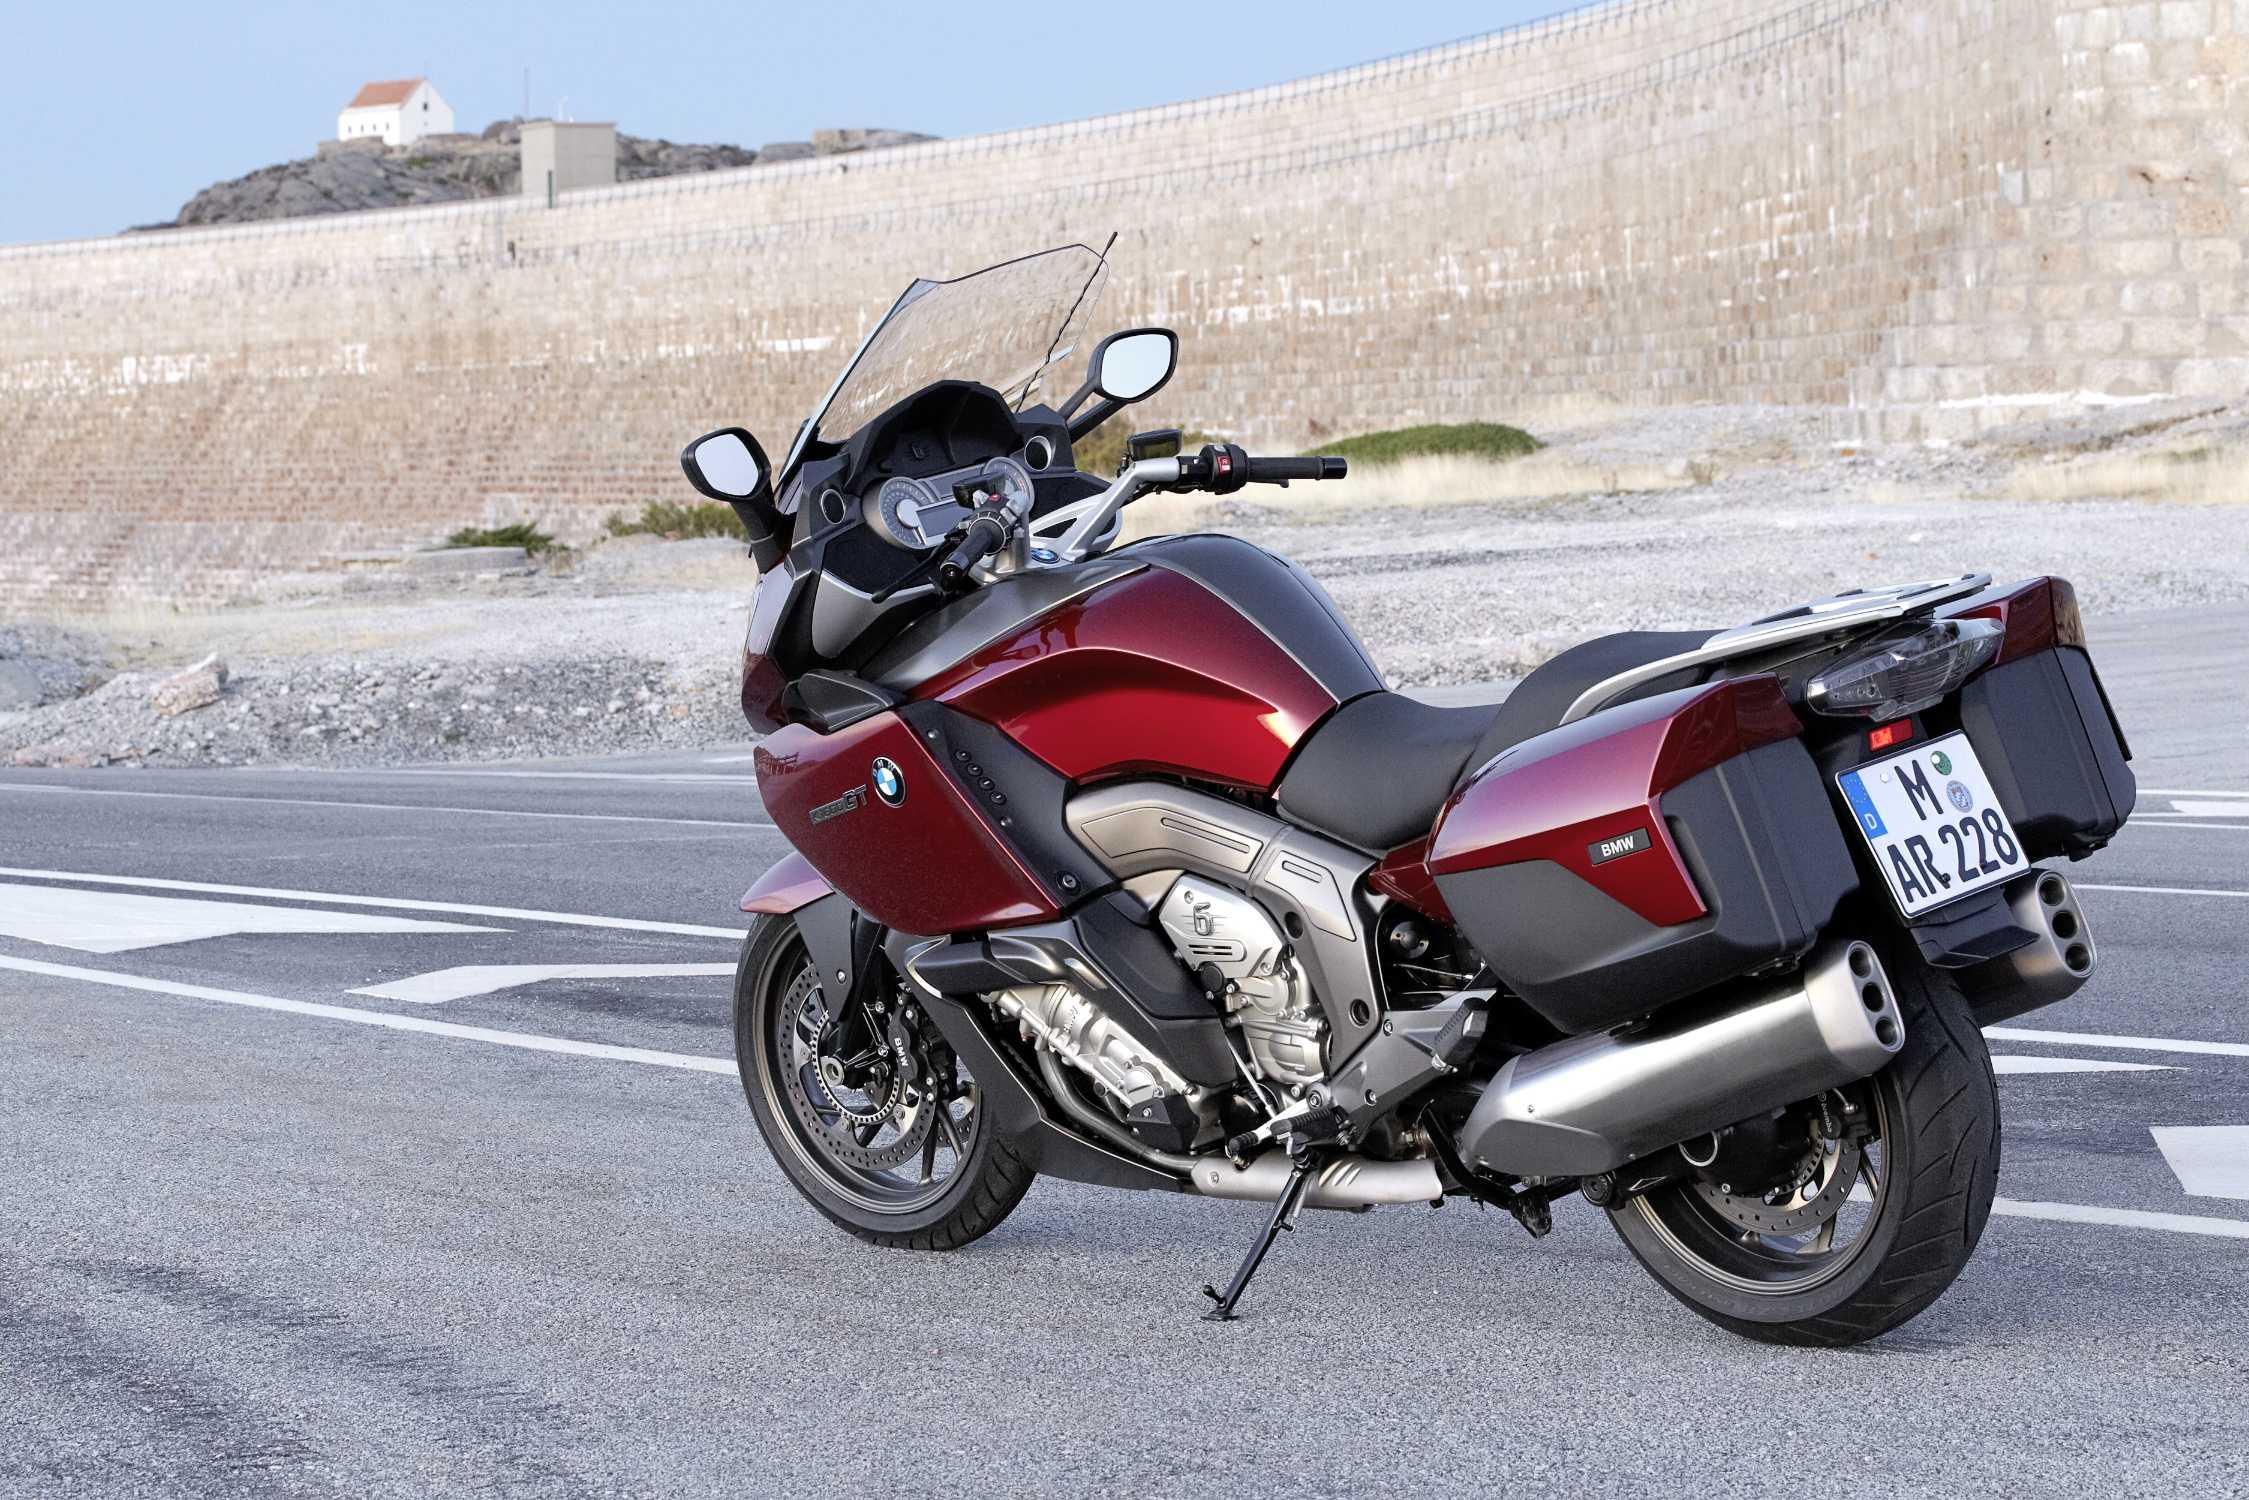 Мотоцикл БМВ k1600gt #9